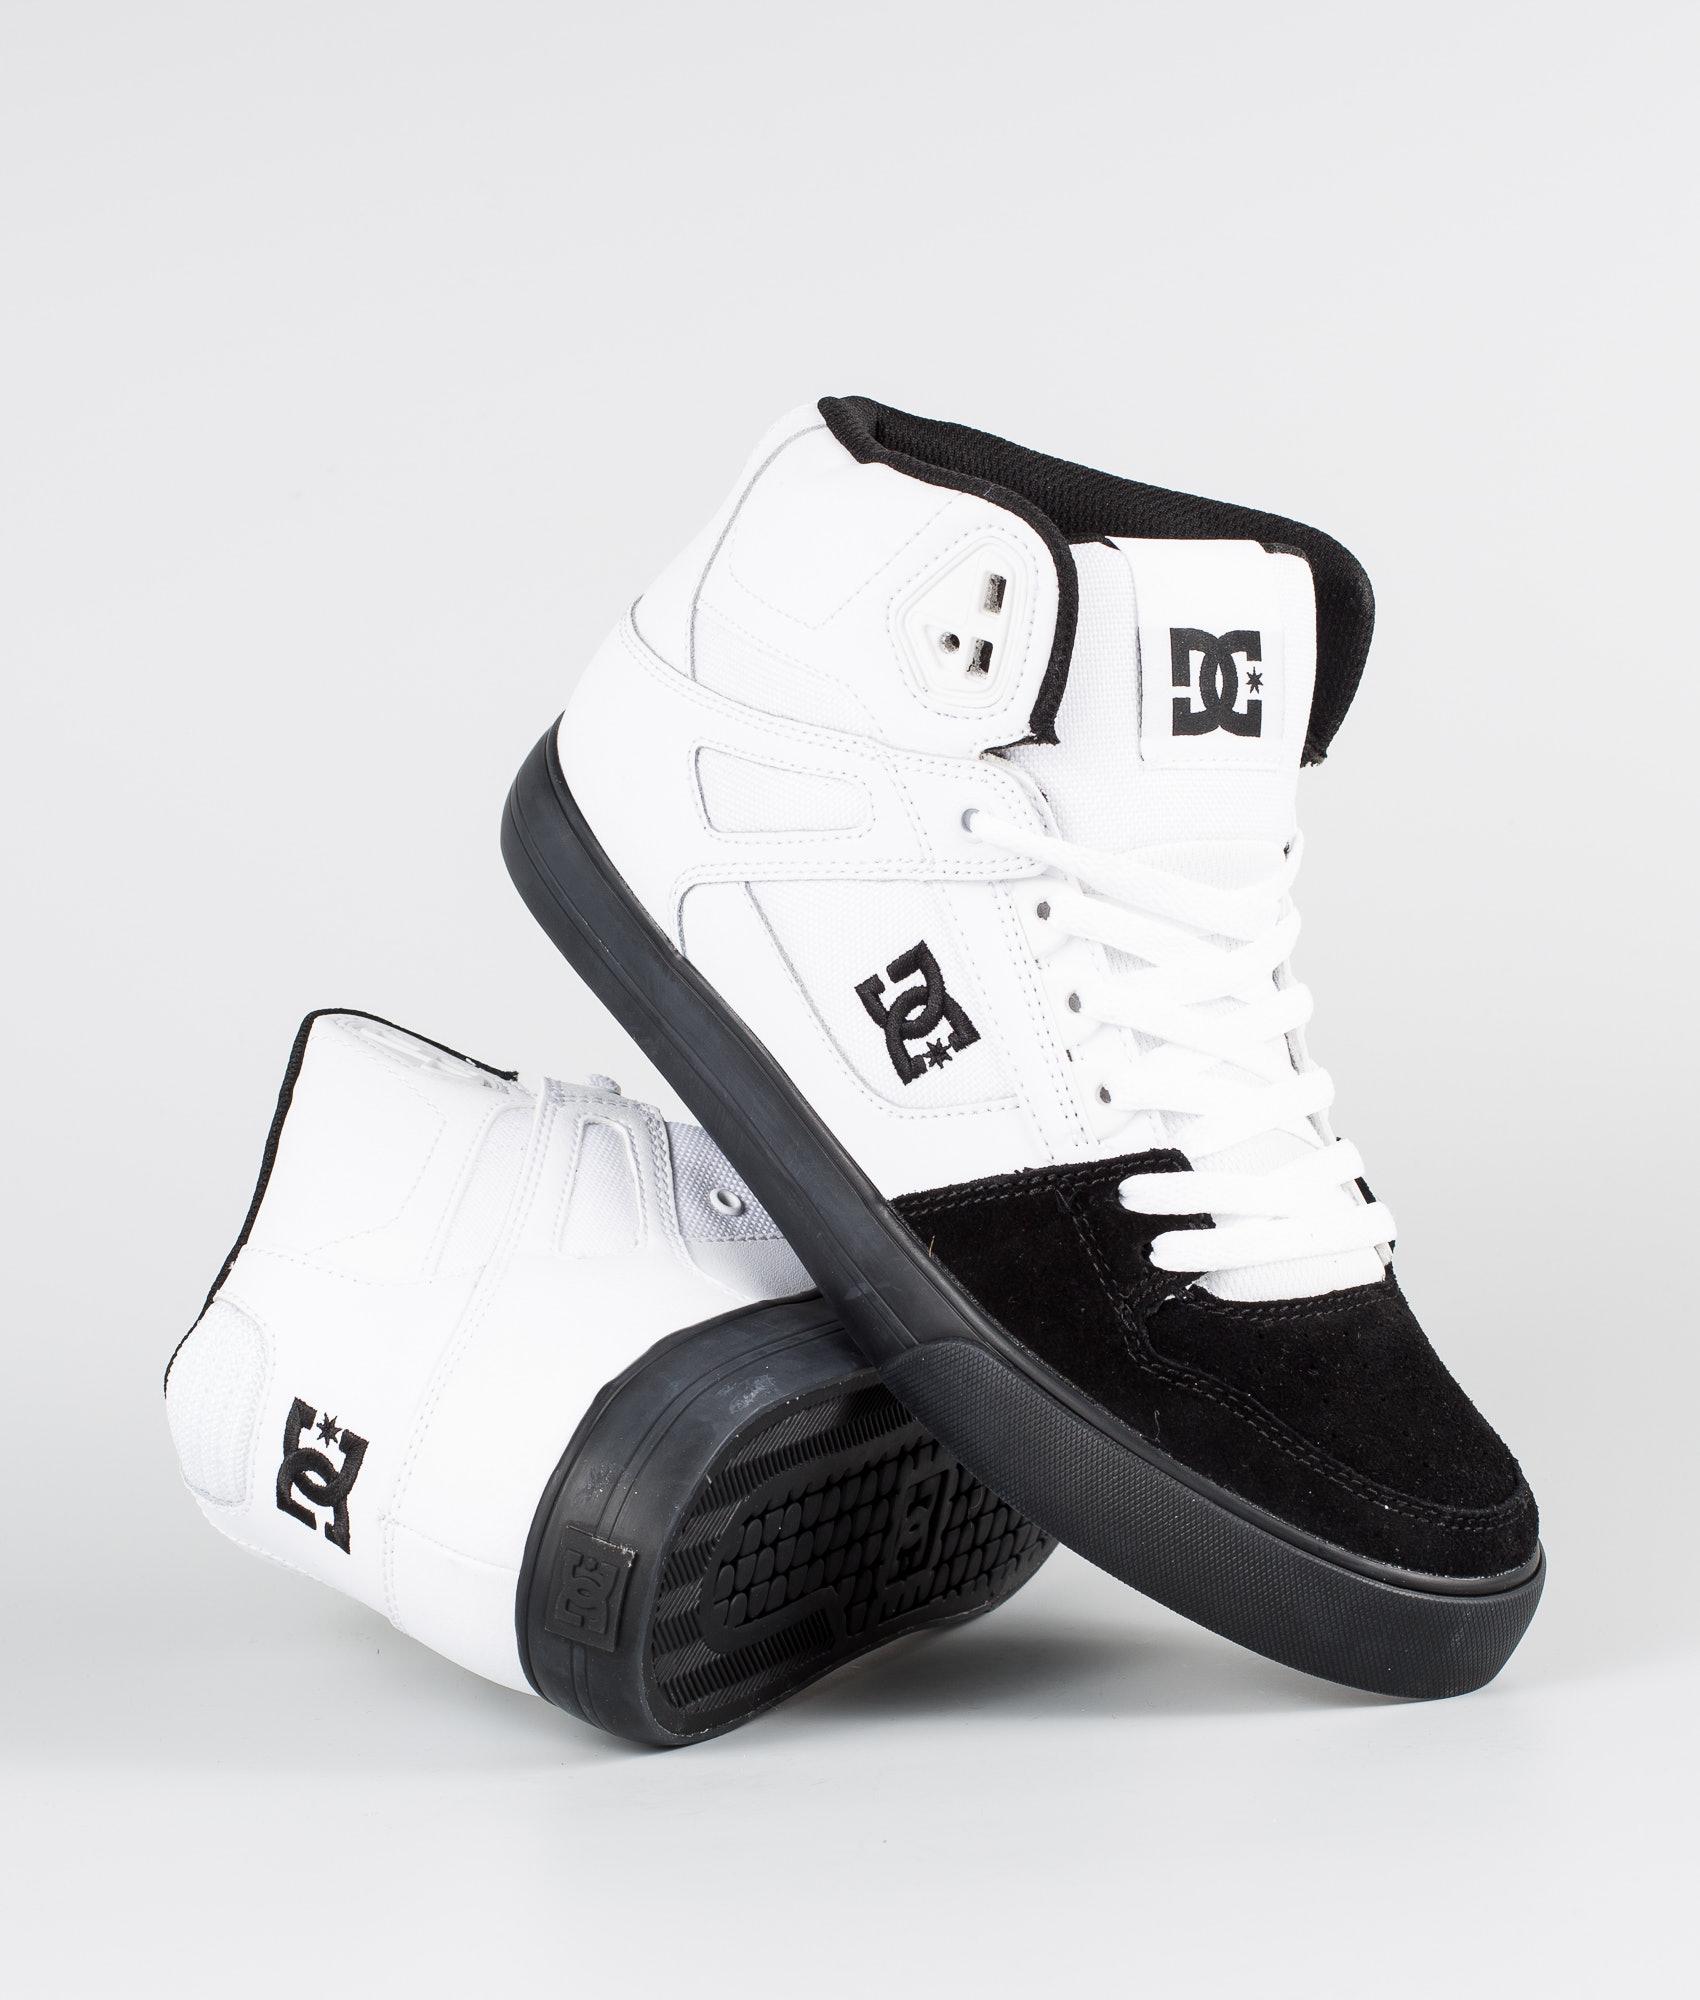 2c9bc8c8 Herr skor Streetwear | Fri Frakt | Ridestore.se